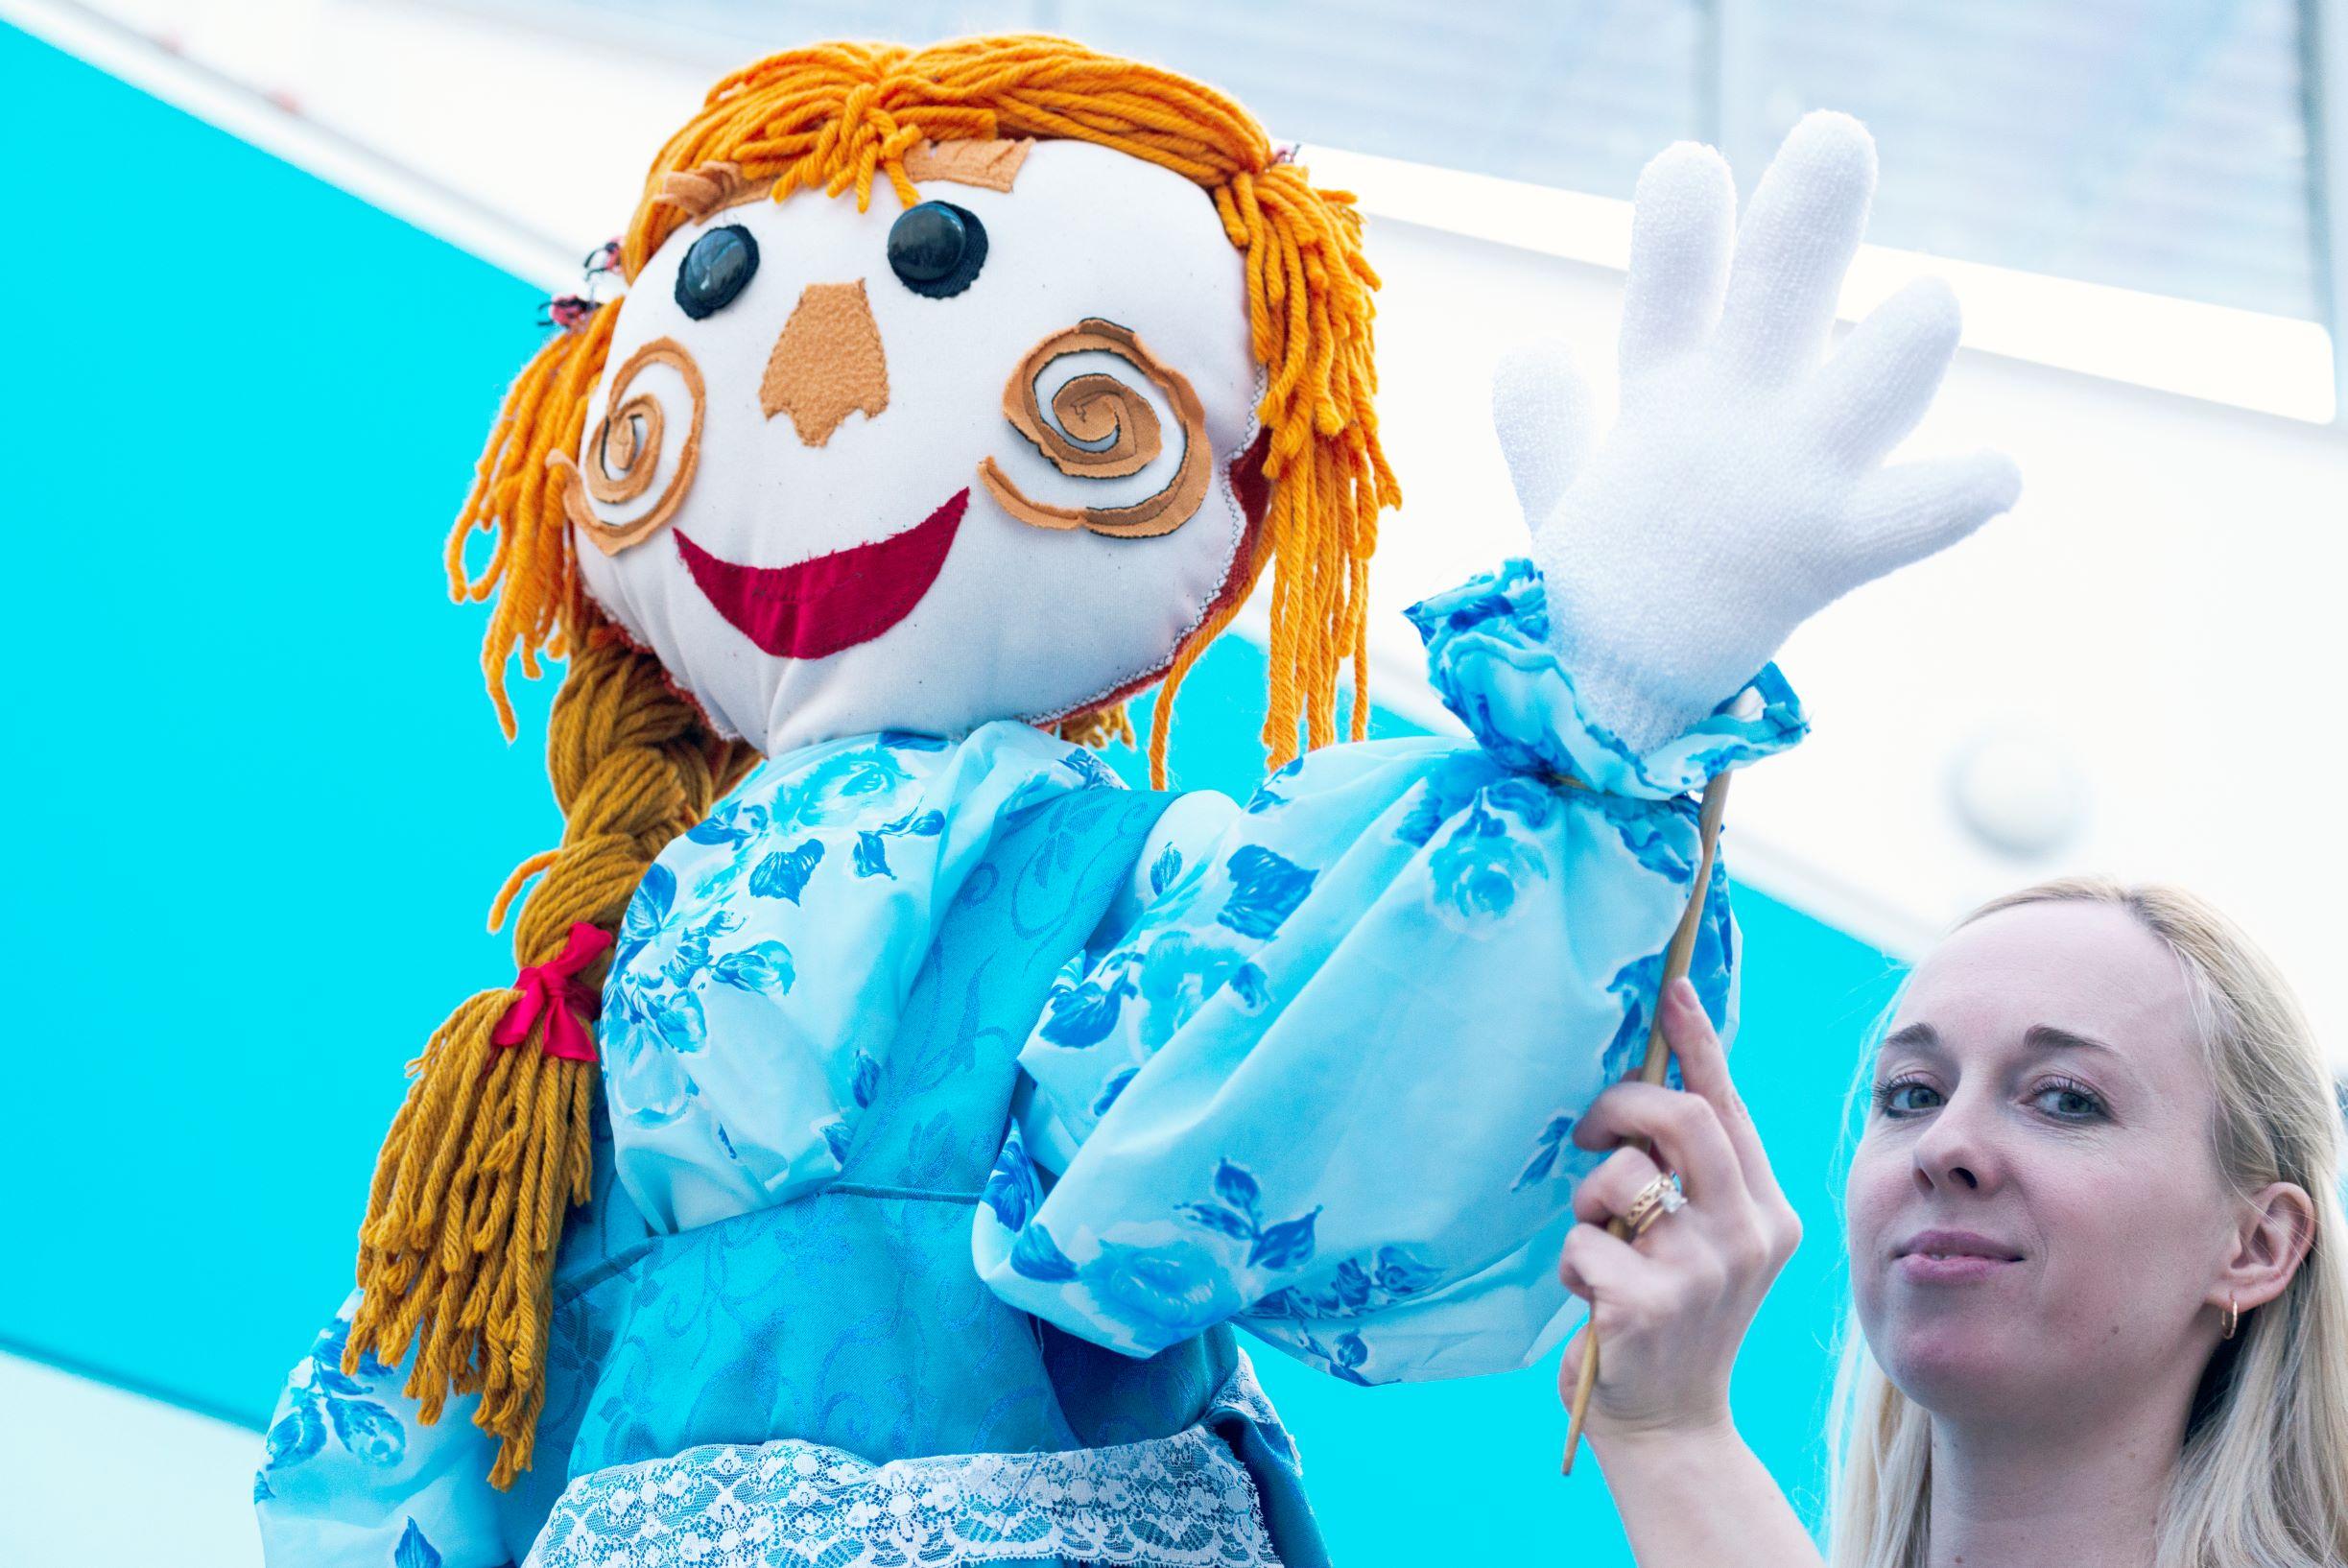 maslenitsa glasgow celebrates an ancient slavic holiday